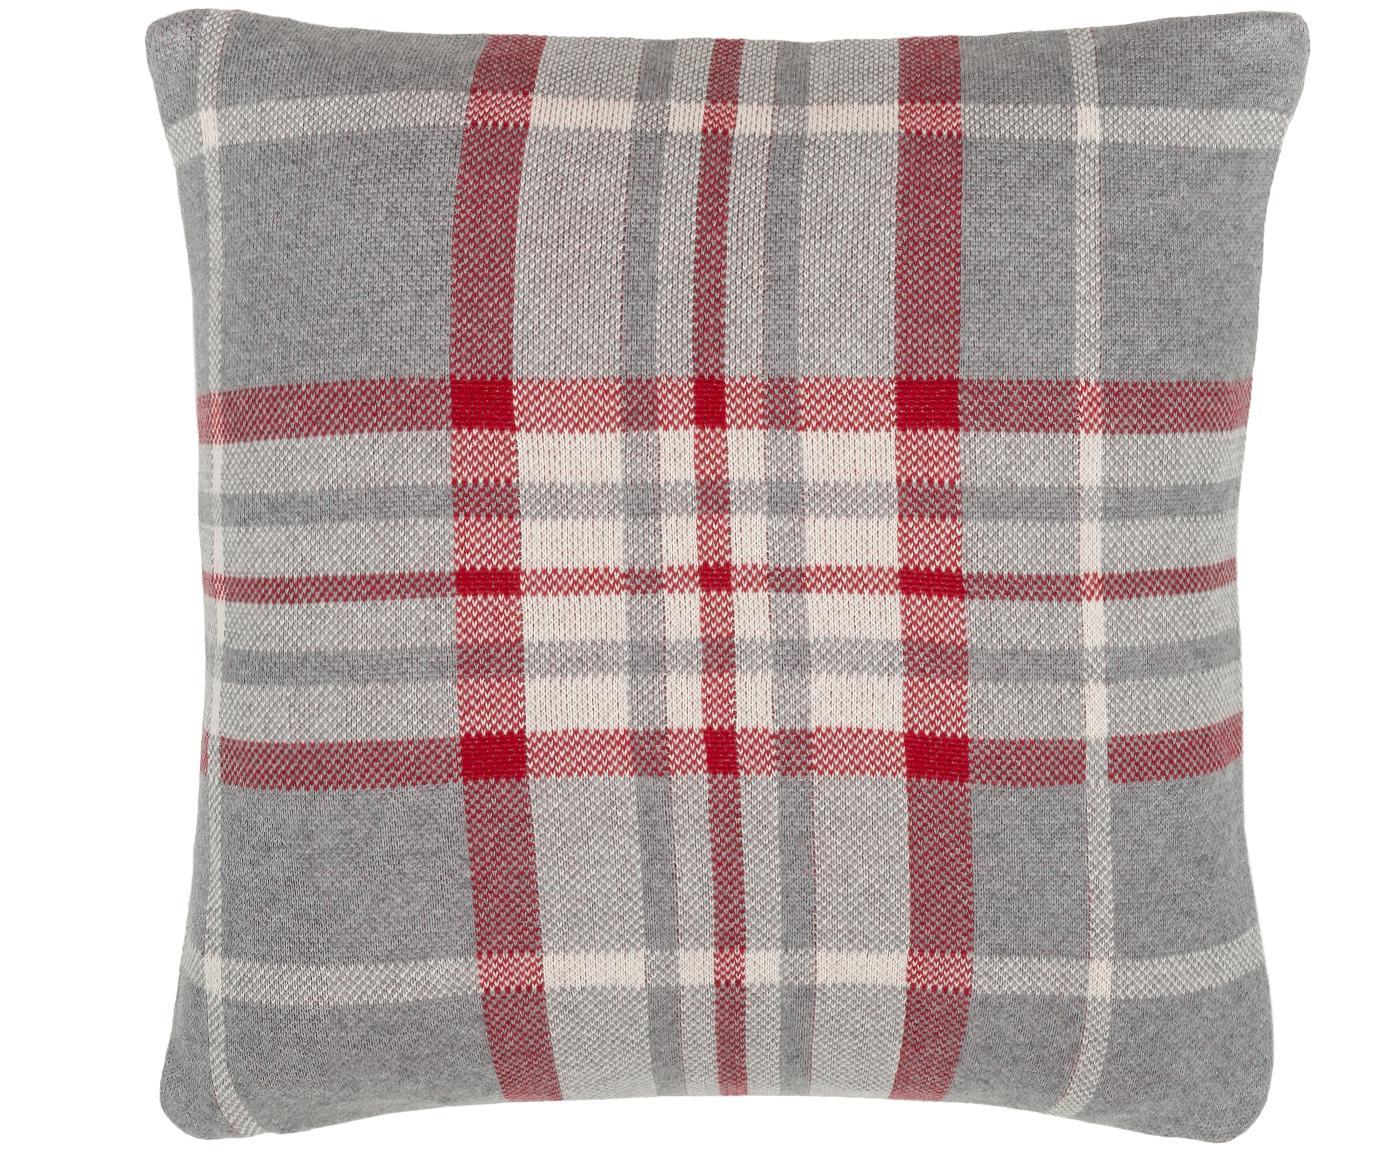 Funda de cojín de punto Louis, 100%algodón, Gris, blanco, rojo, 40 x 40 cm